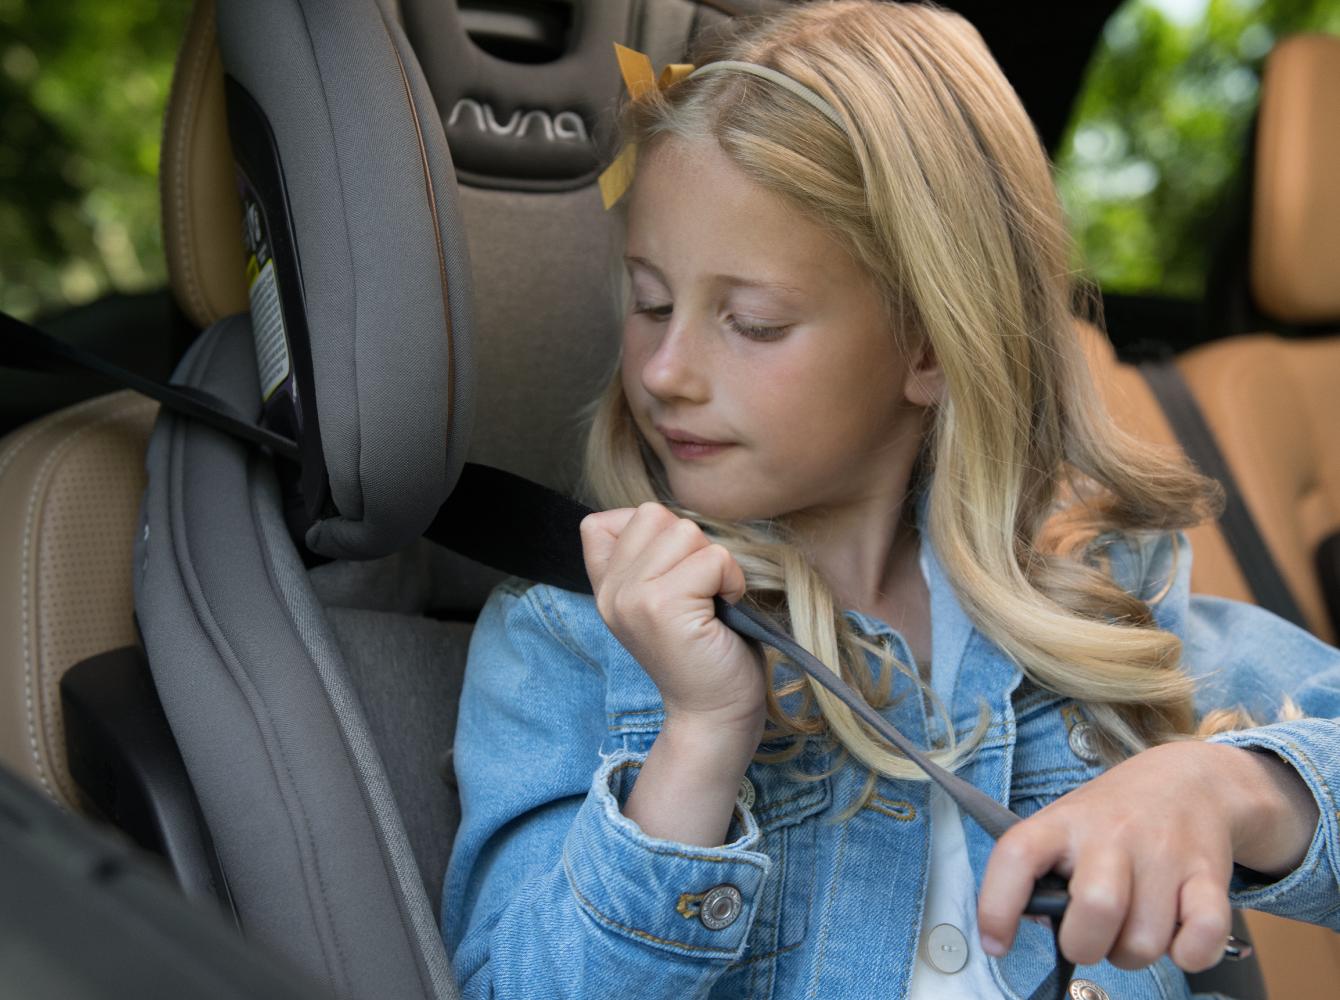 Nuna Exec Convertible Car Seat Converts to Seatbelt Positioning Booster